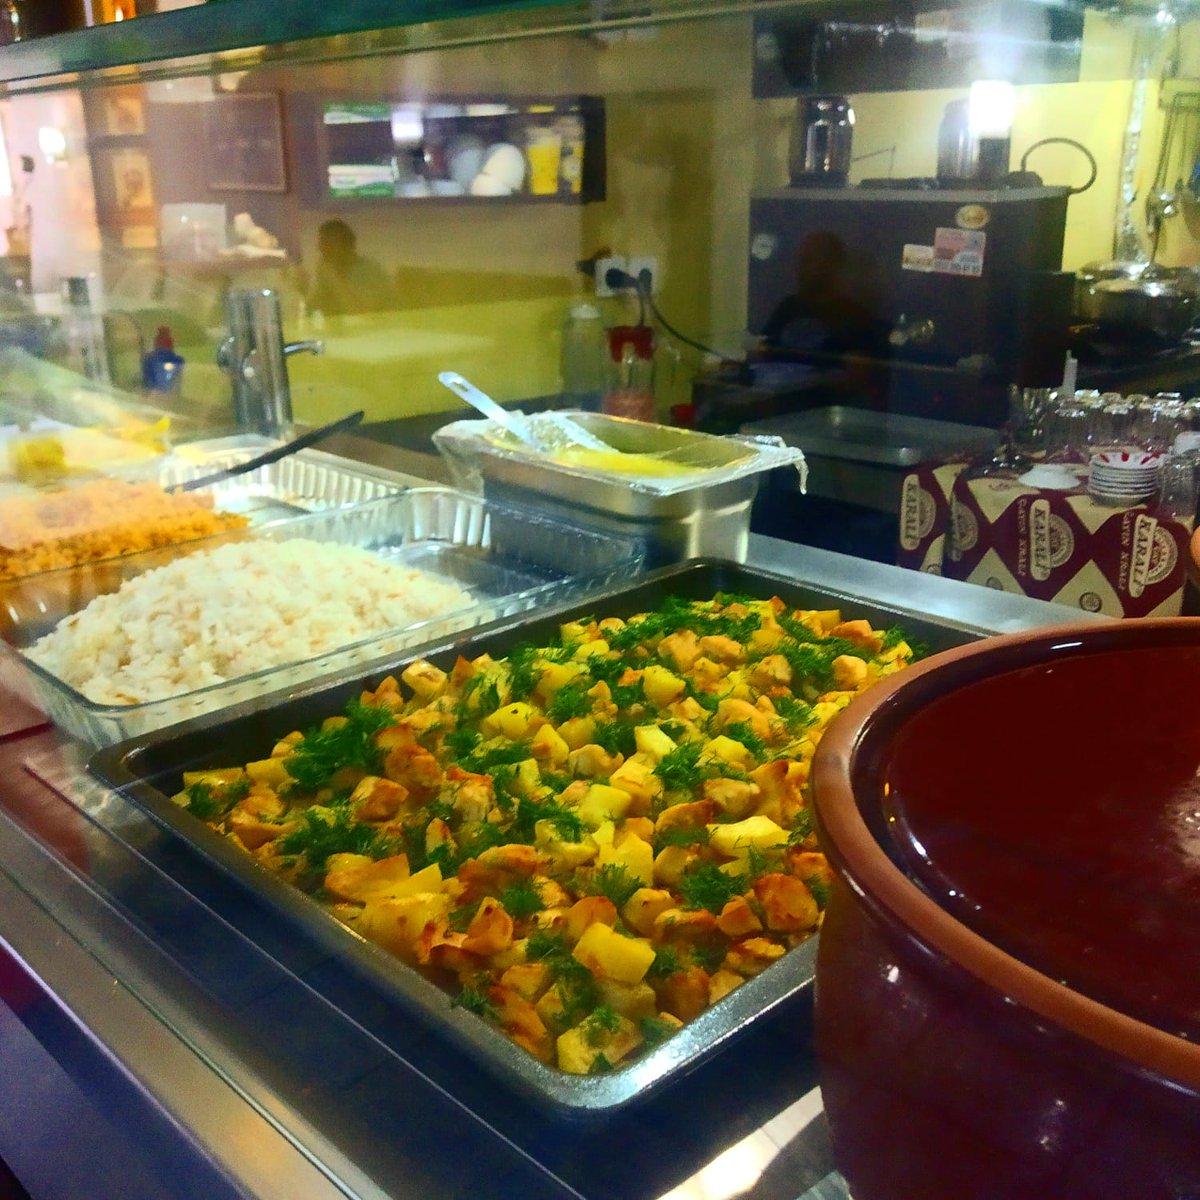 Mis gibi ev yemeklerimiz sizi bekliyor...  #taksim #beyoglu #sishane #omayracafe #istiklalcaddesi pic.twitter.com/QtcW0Gijlb